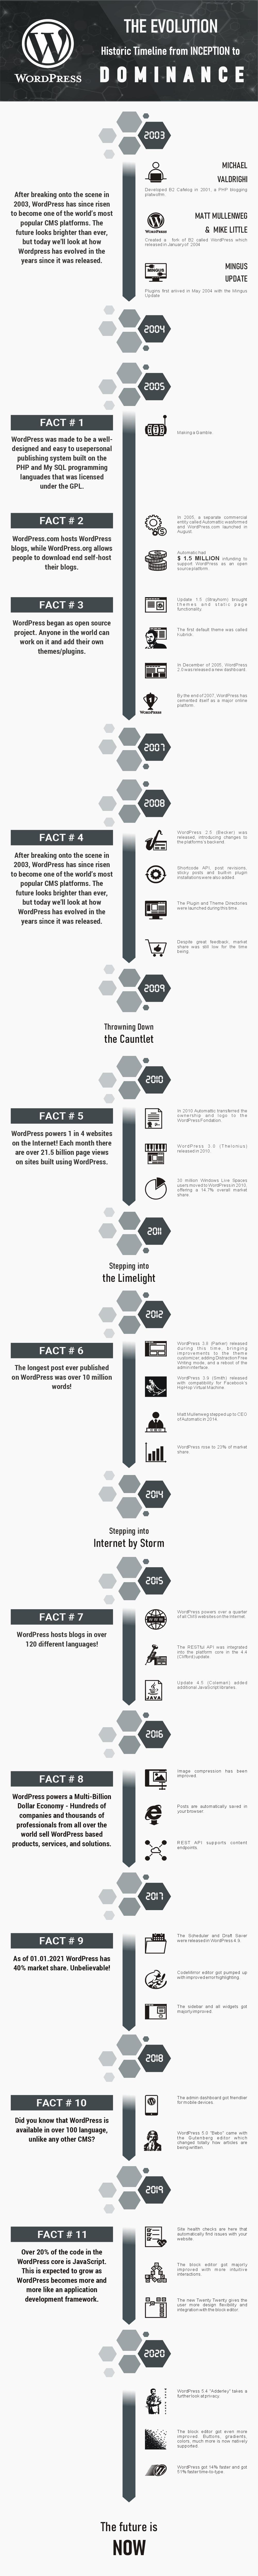 WordPress Evolution